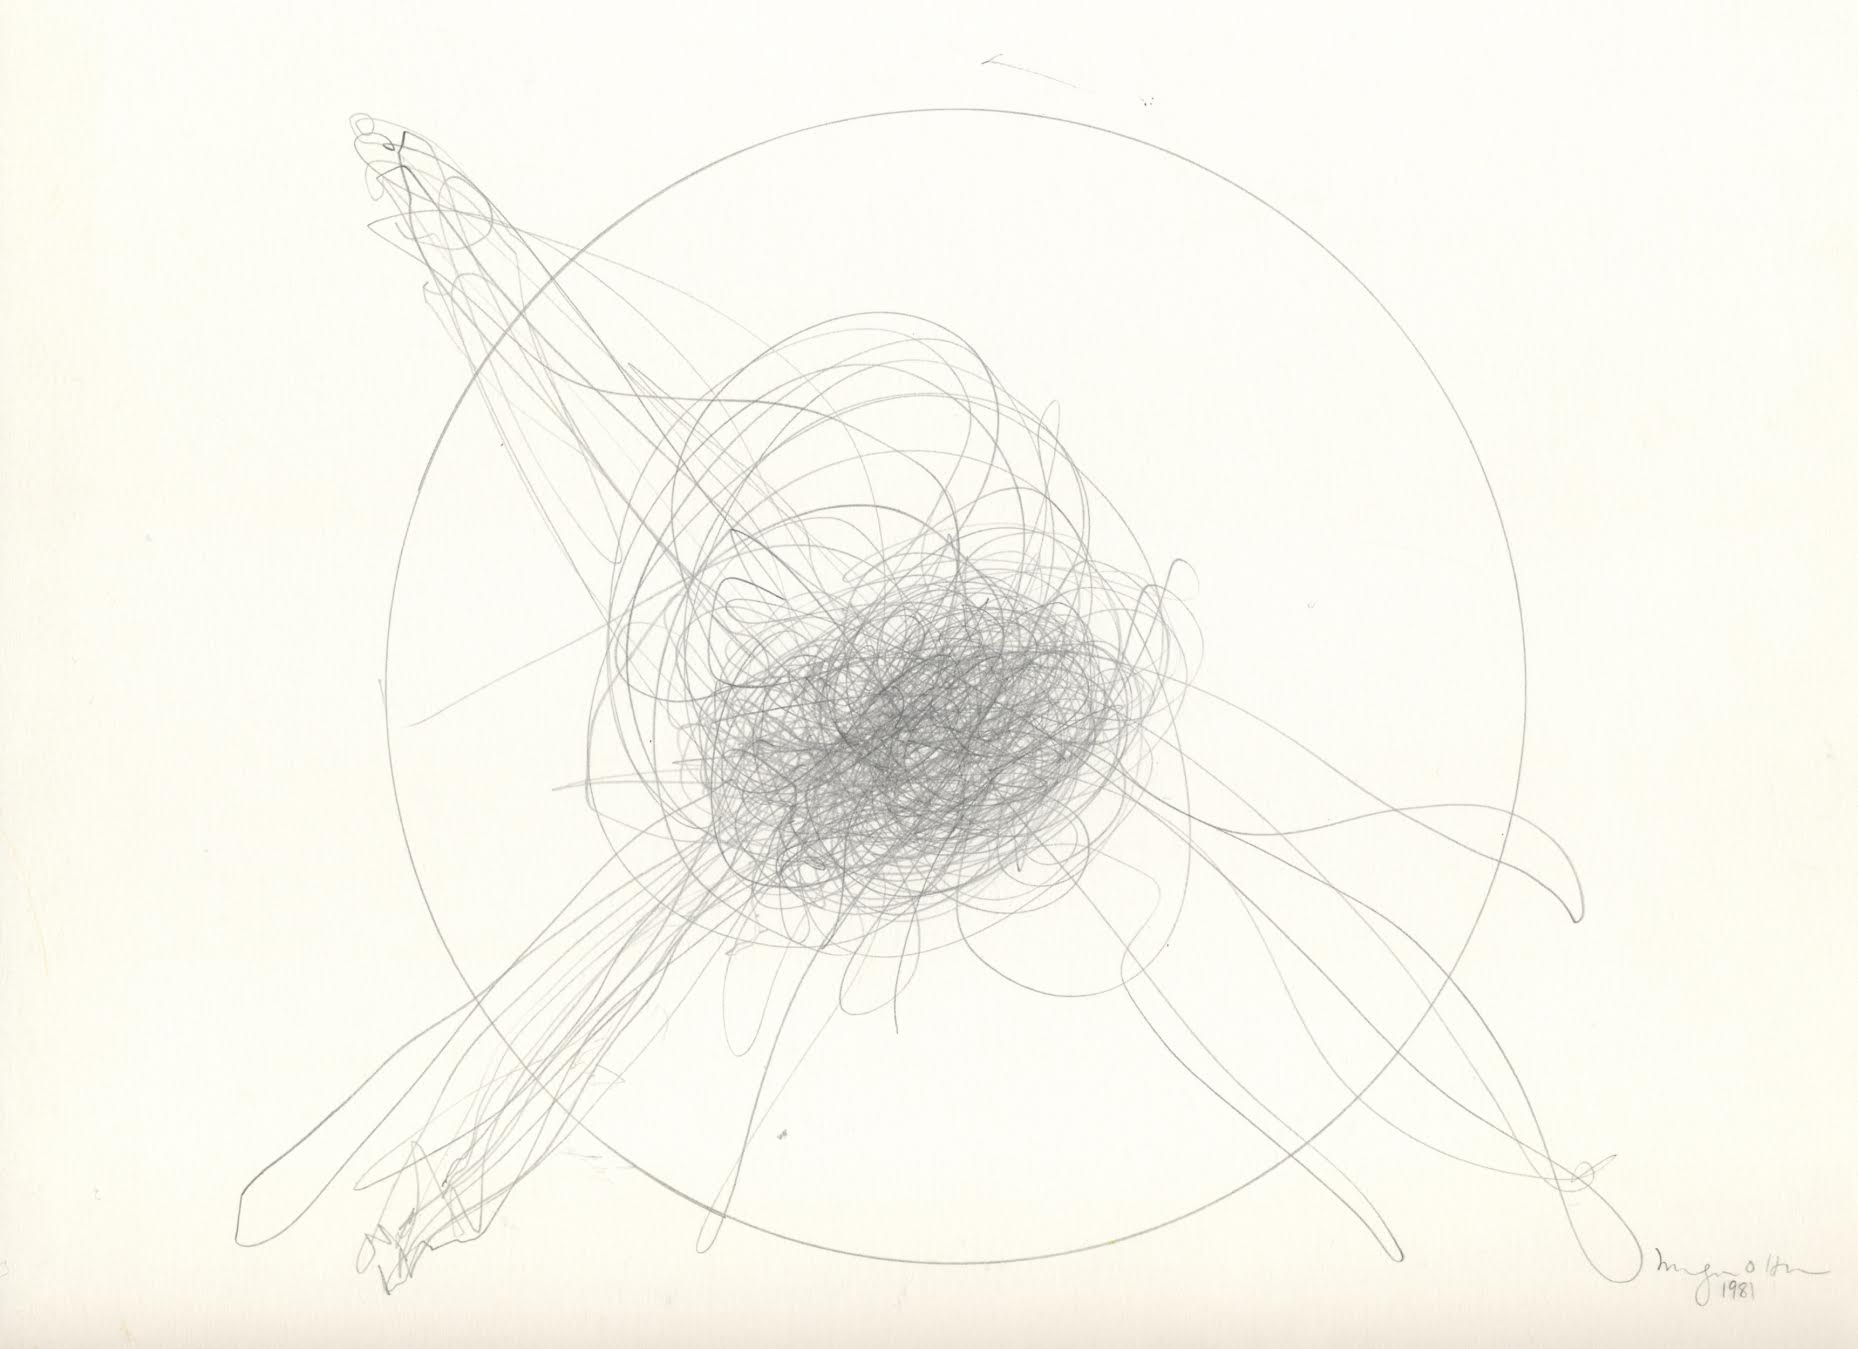 Morgan O'Hara, LIVE TRANSMISSION: Hand movements / Chinese chef / San Francisco / 1981, 10 x 12 in.,Graphite on Bristol paper, 1981